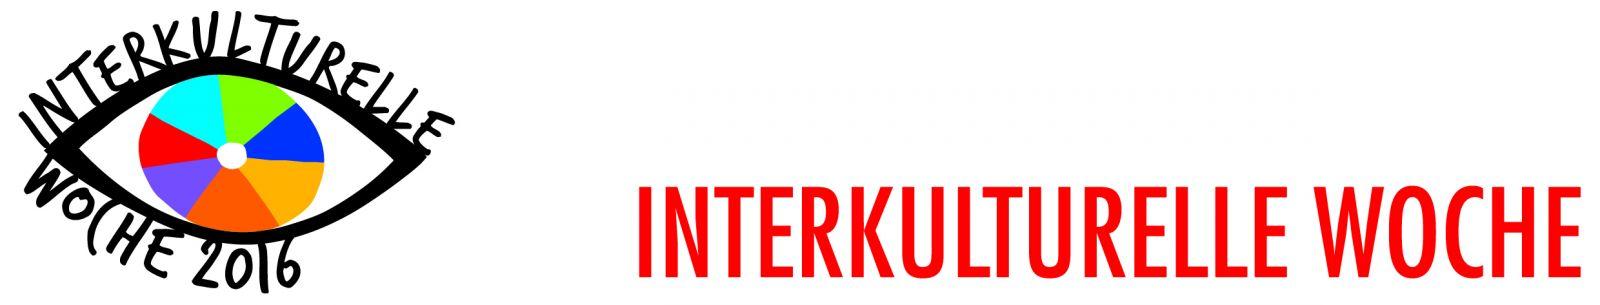 Logo IKW 201